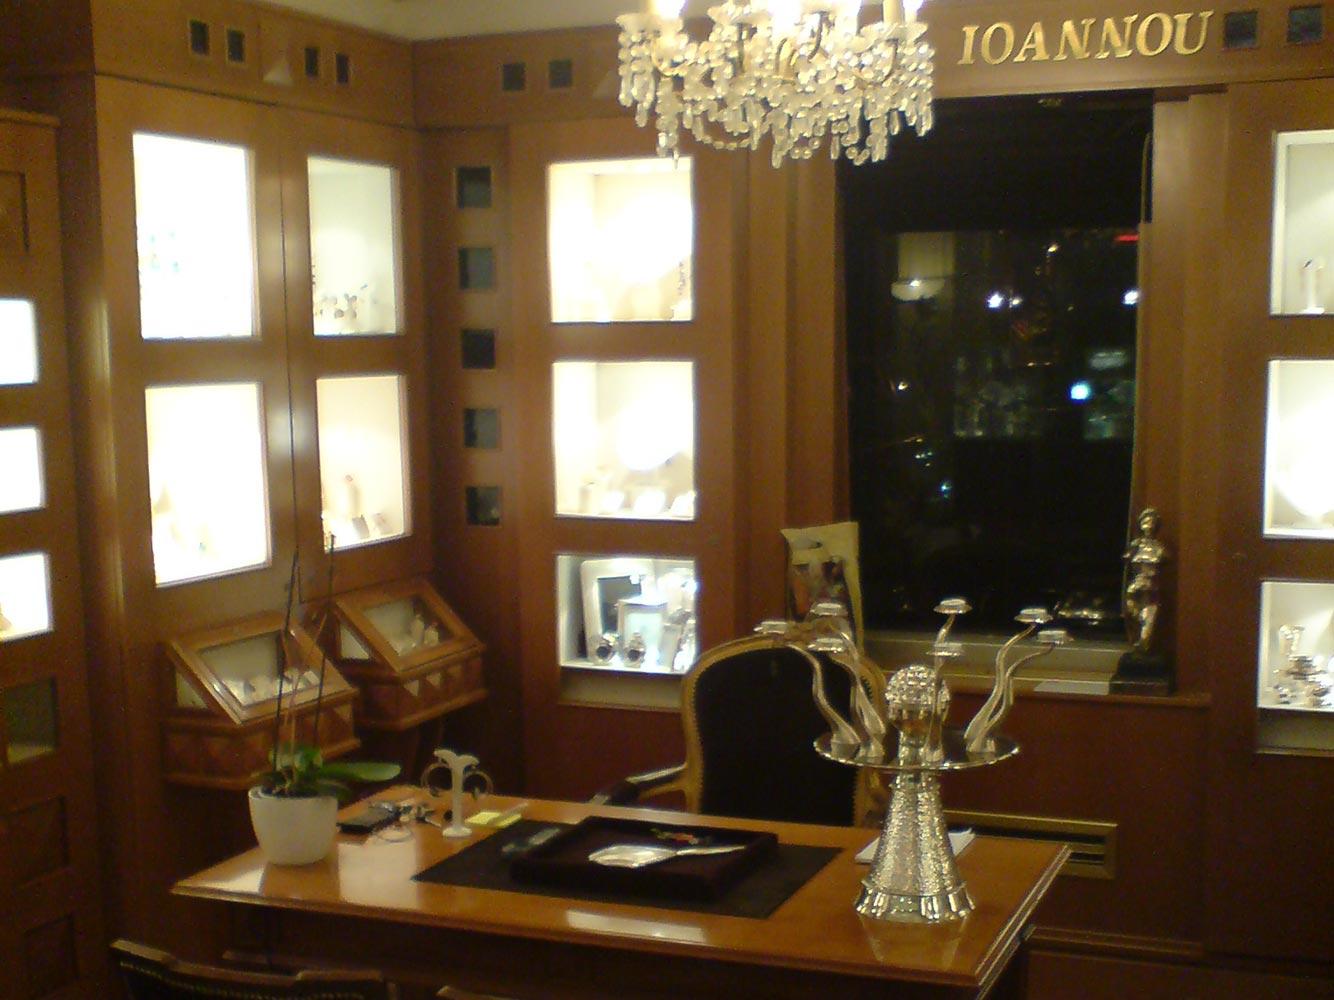 cipro-nikos-ioannou-Jewelery-3